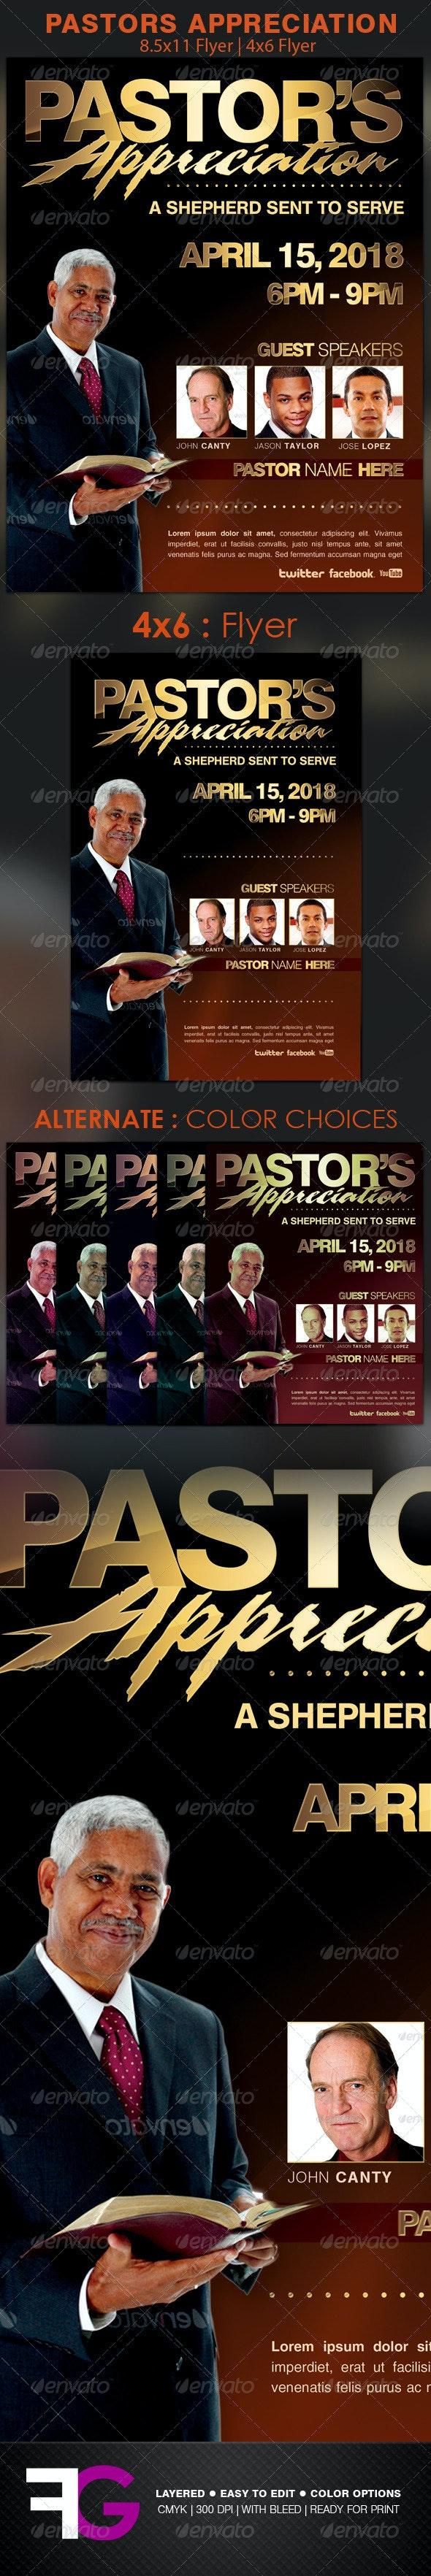 Pastors Appreciation Church Flyer Template - Church Flyers